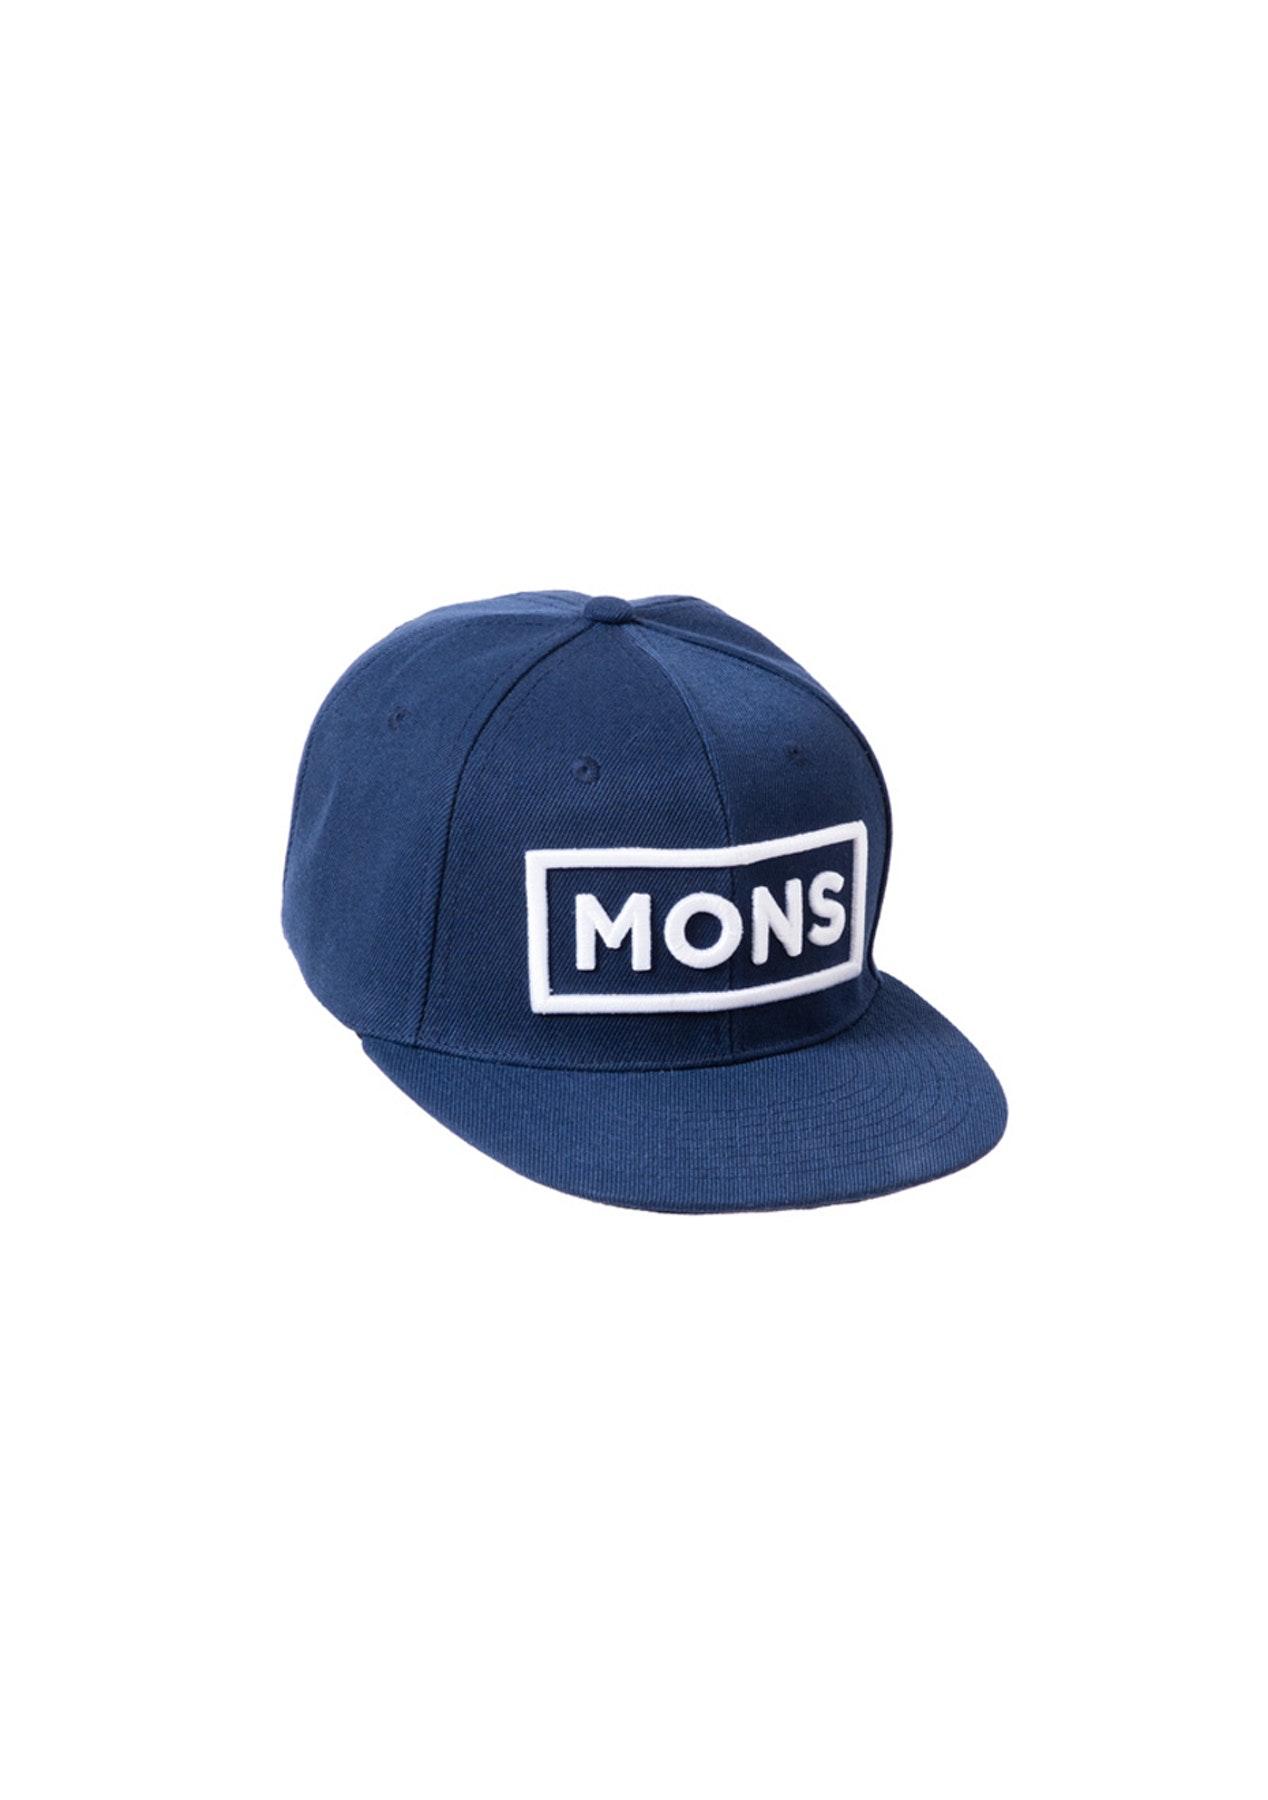 Mons Royale - Connor Cap Border - Navy